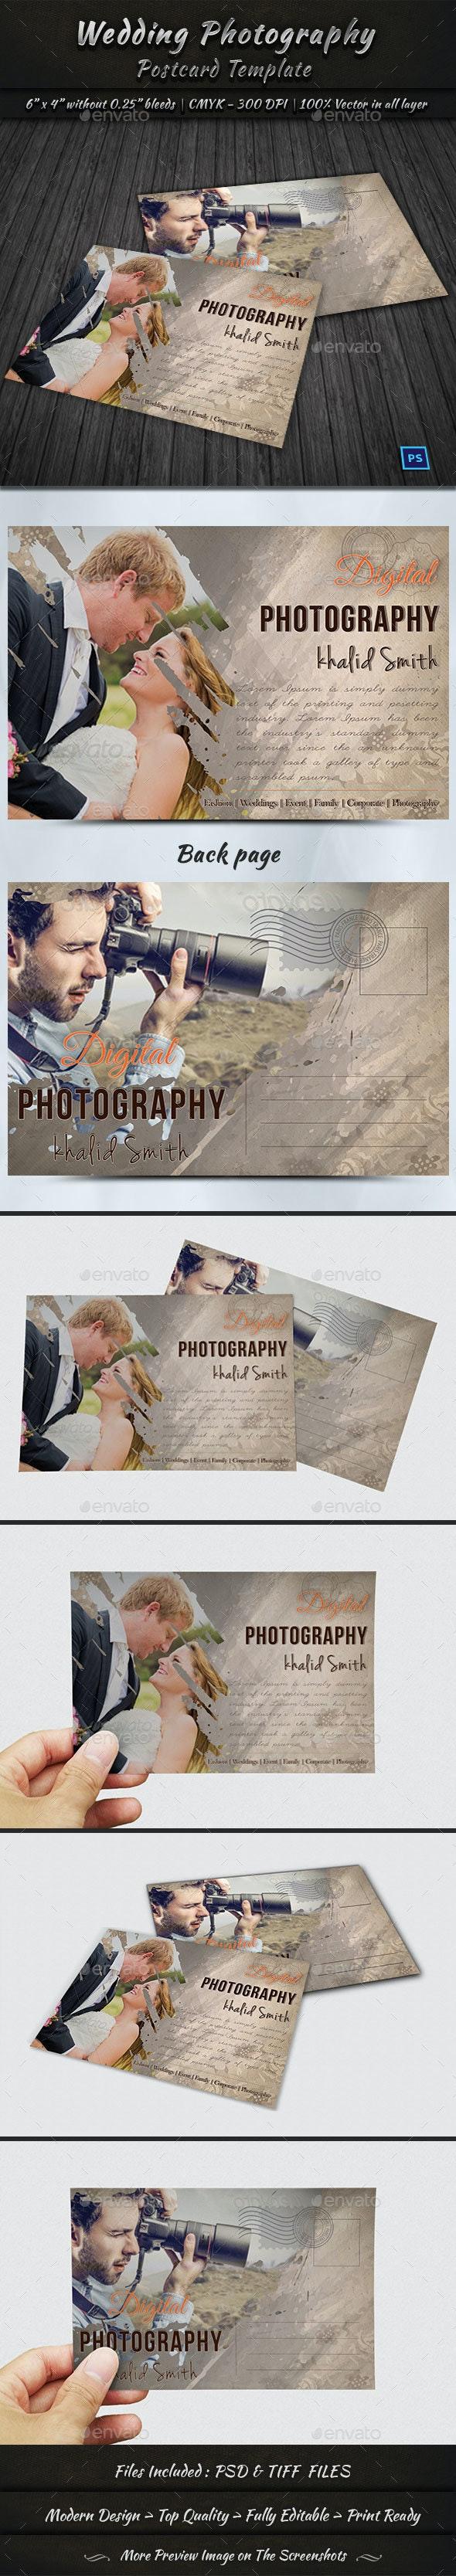 Wedding Photography Postcard Template - Cards & Invites Print Templates